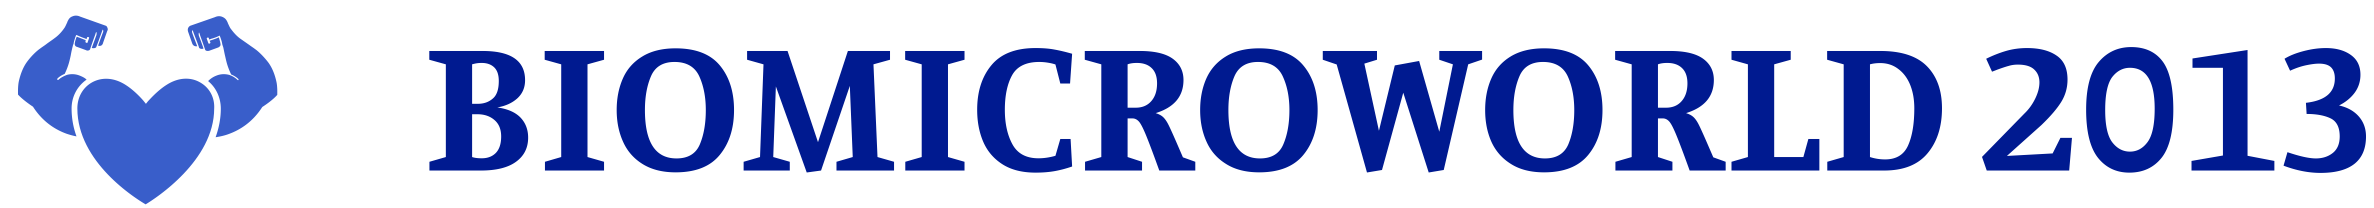 BioMicroWorld 2013